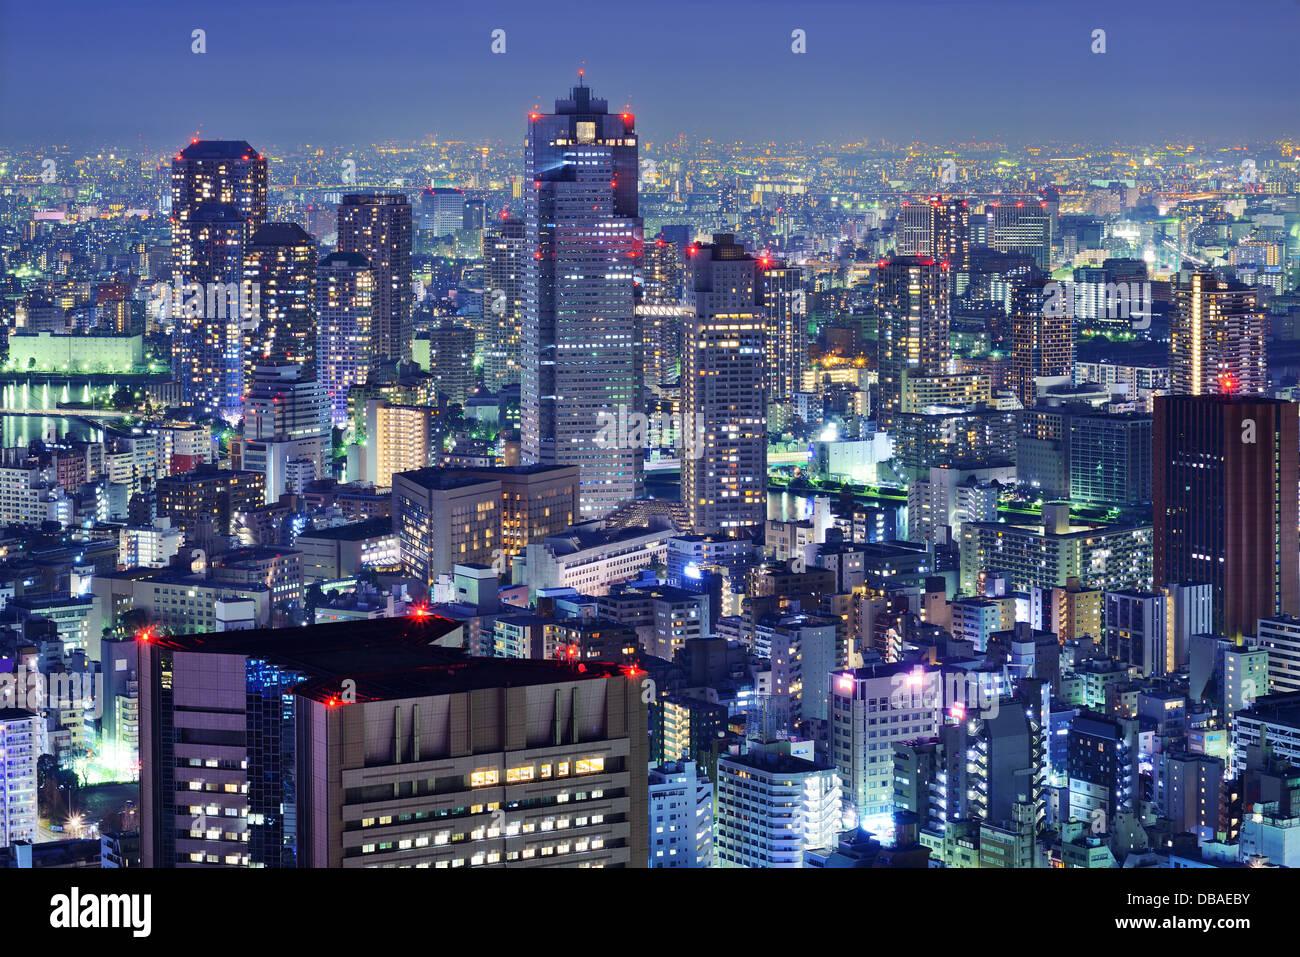 Tsukiji District skyline di Tokyo, Giappone. Immagini Stock